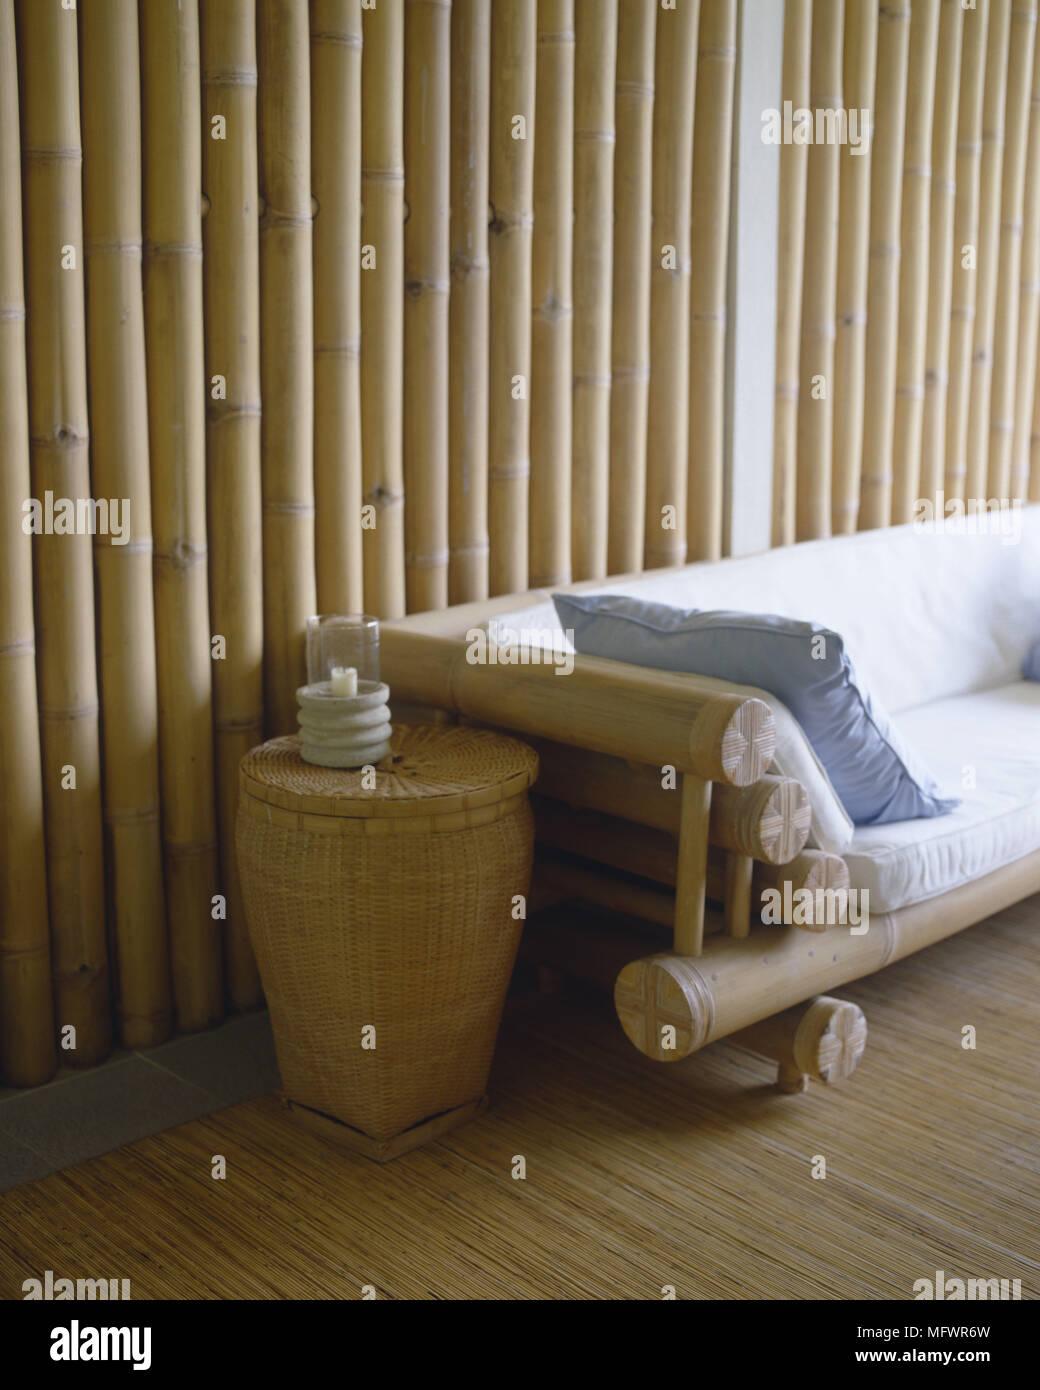 Bambusrahmen Sitz neben Weidenkorb vor Bambus Wand Stockfoto, Bild ...